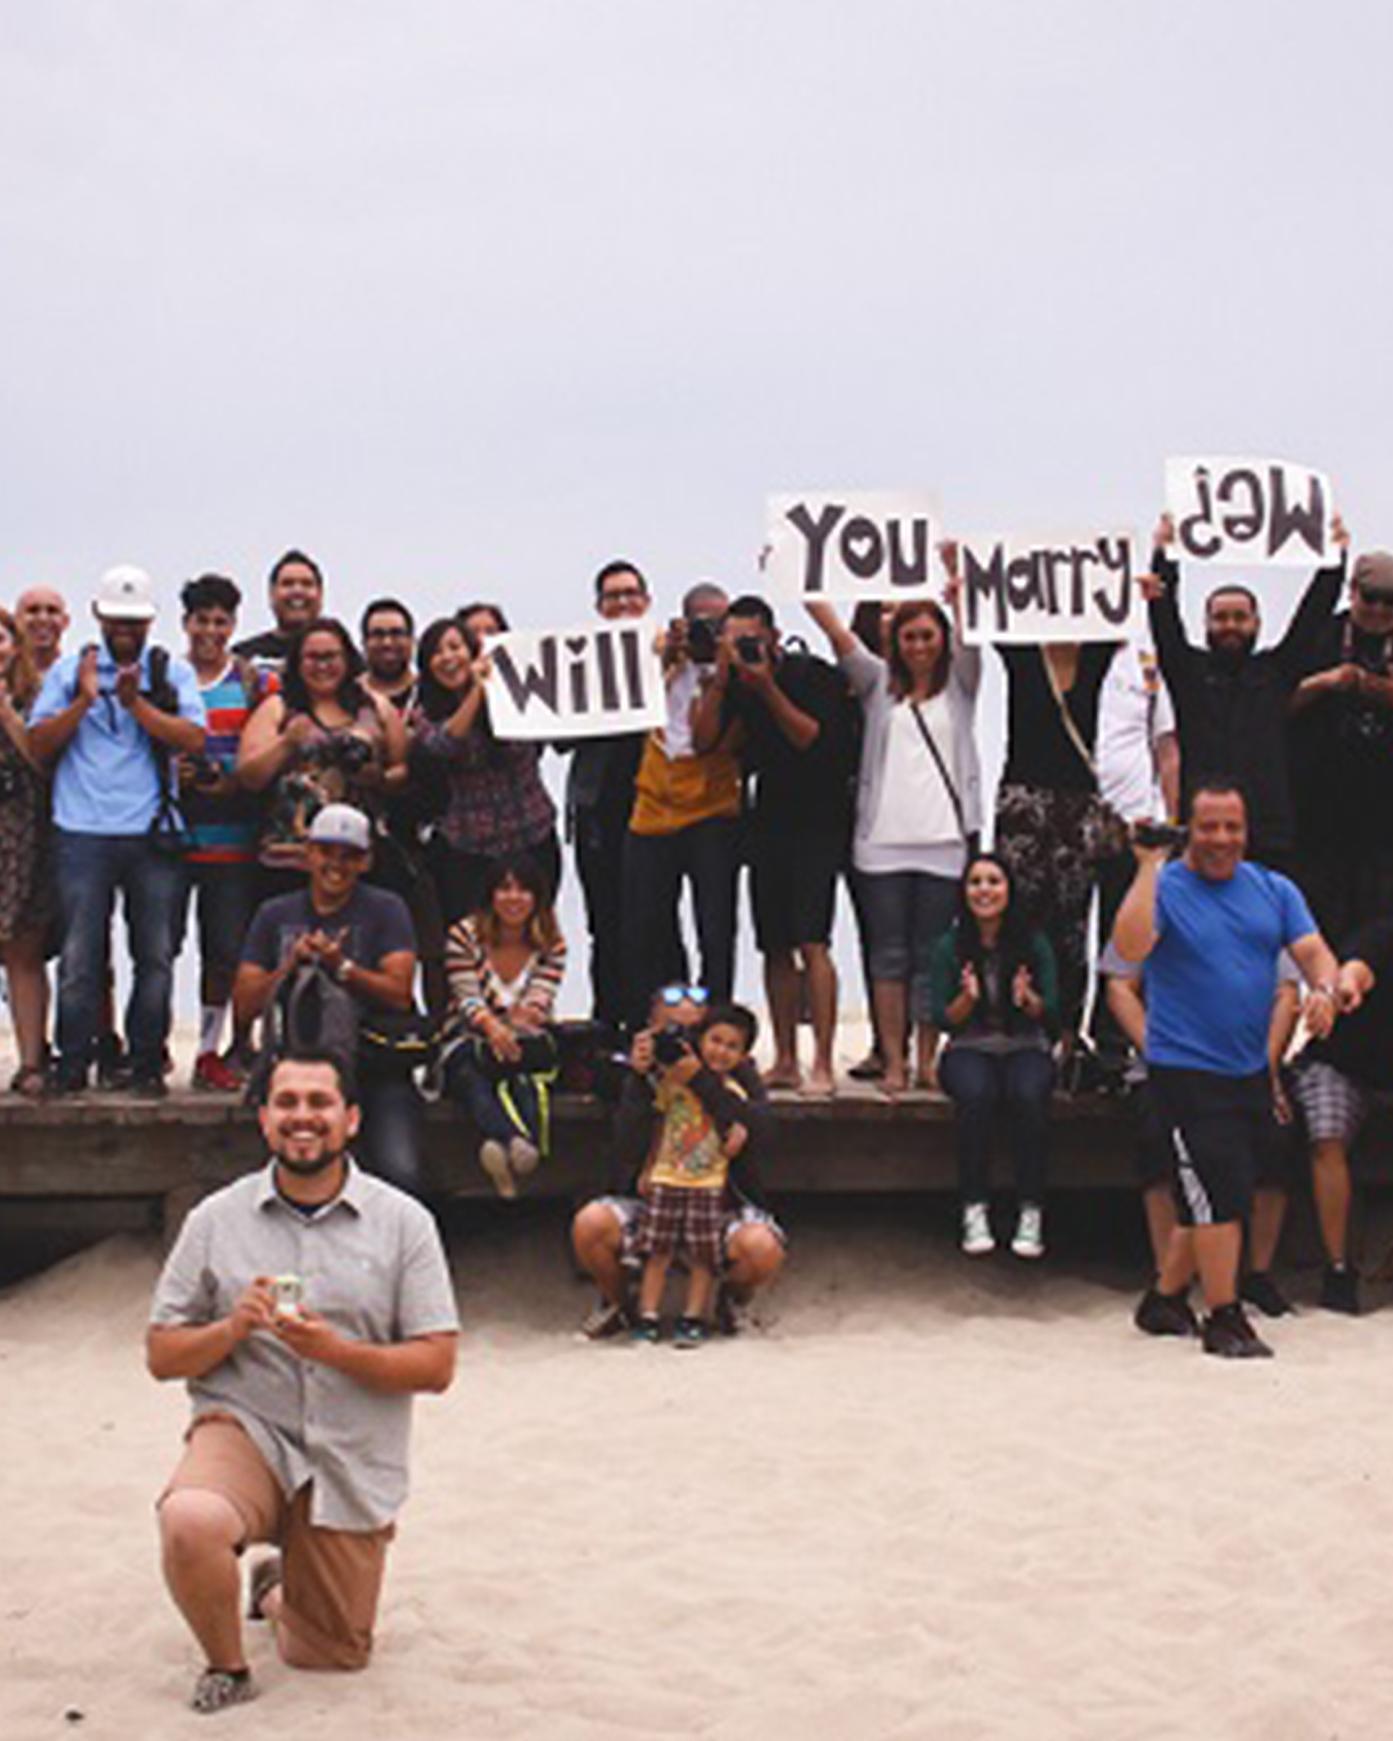 beach-proposal-1215